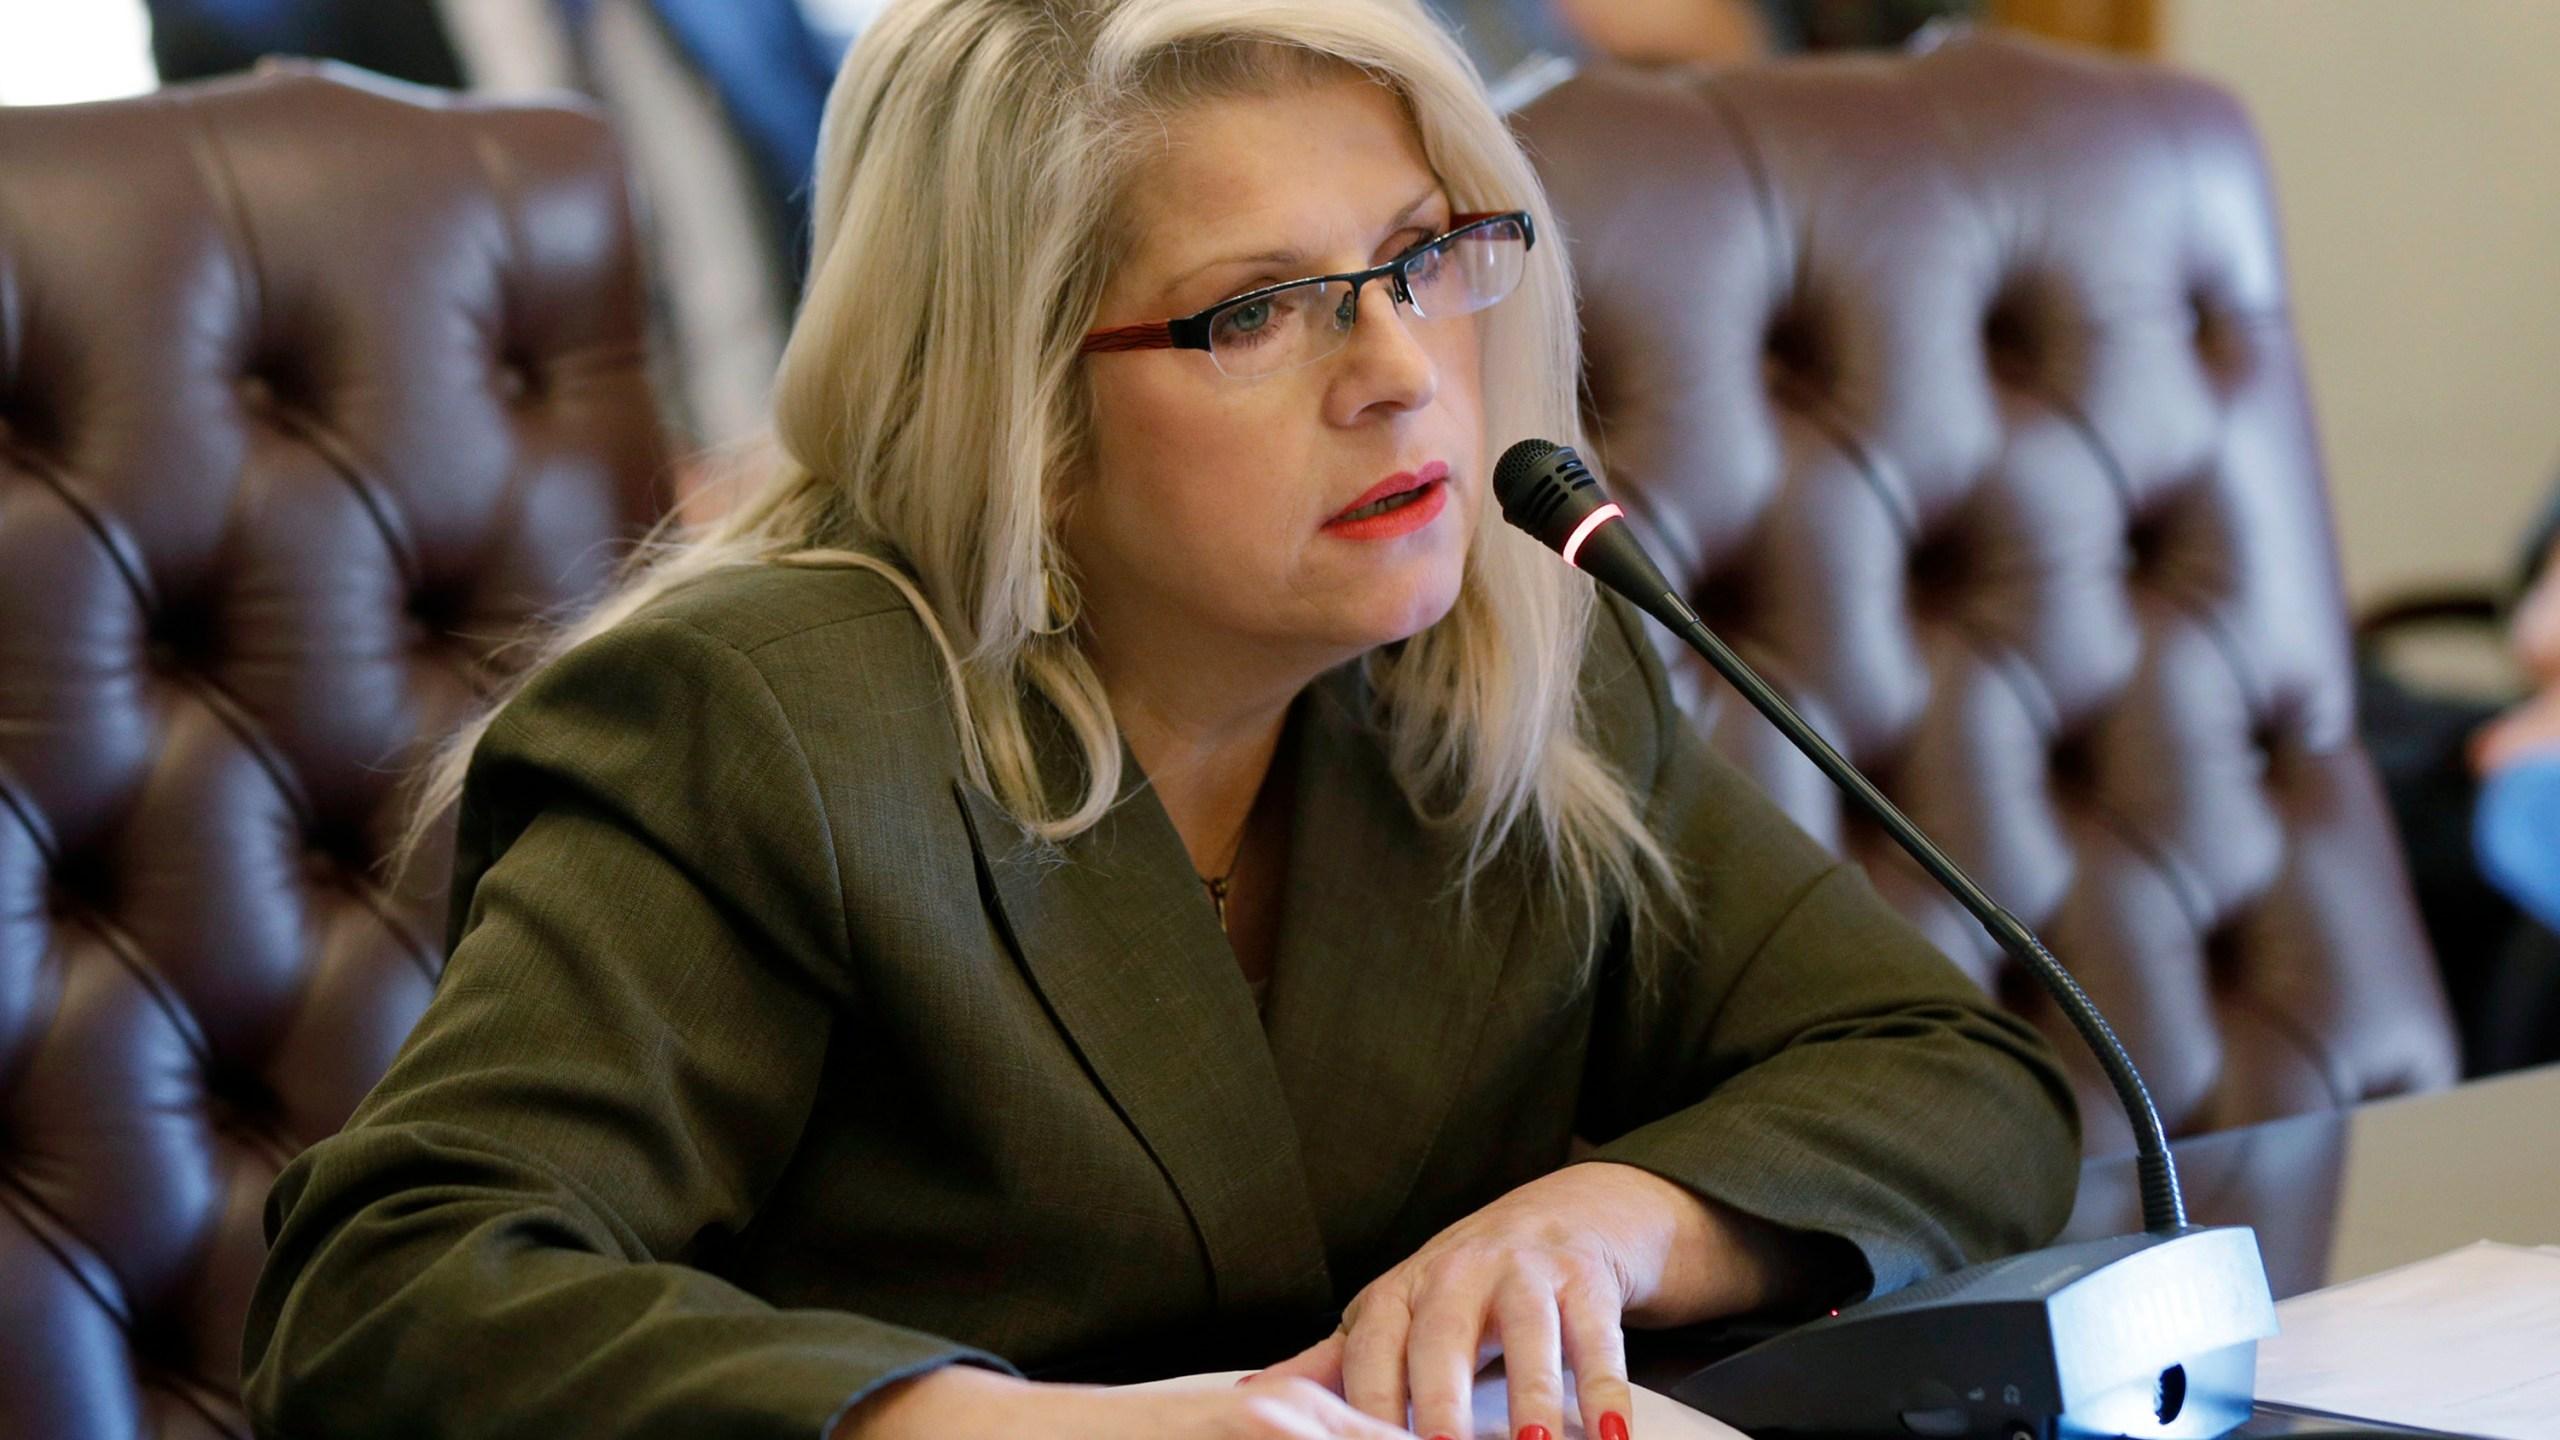 Arkansas_Lawmaker_Death_03286-159532.jpg64825129